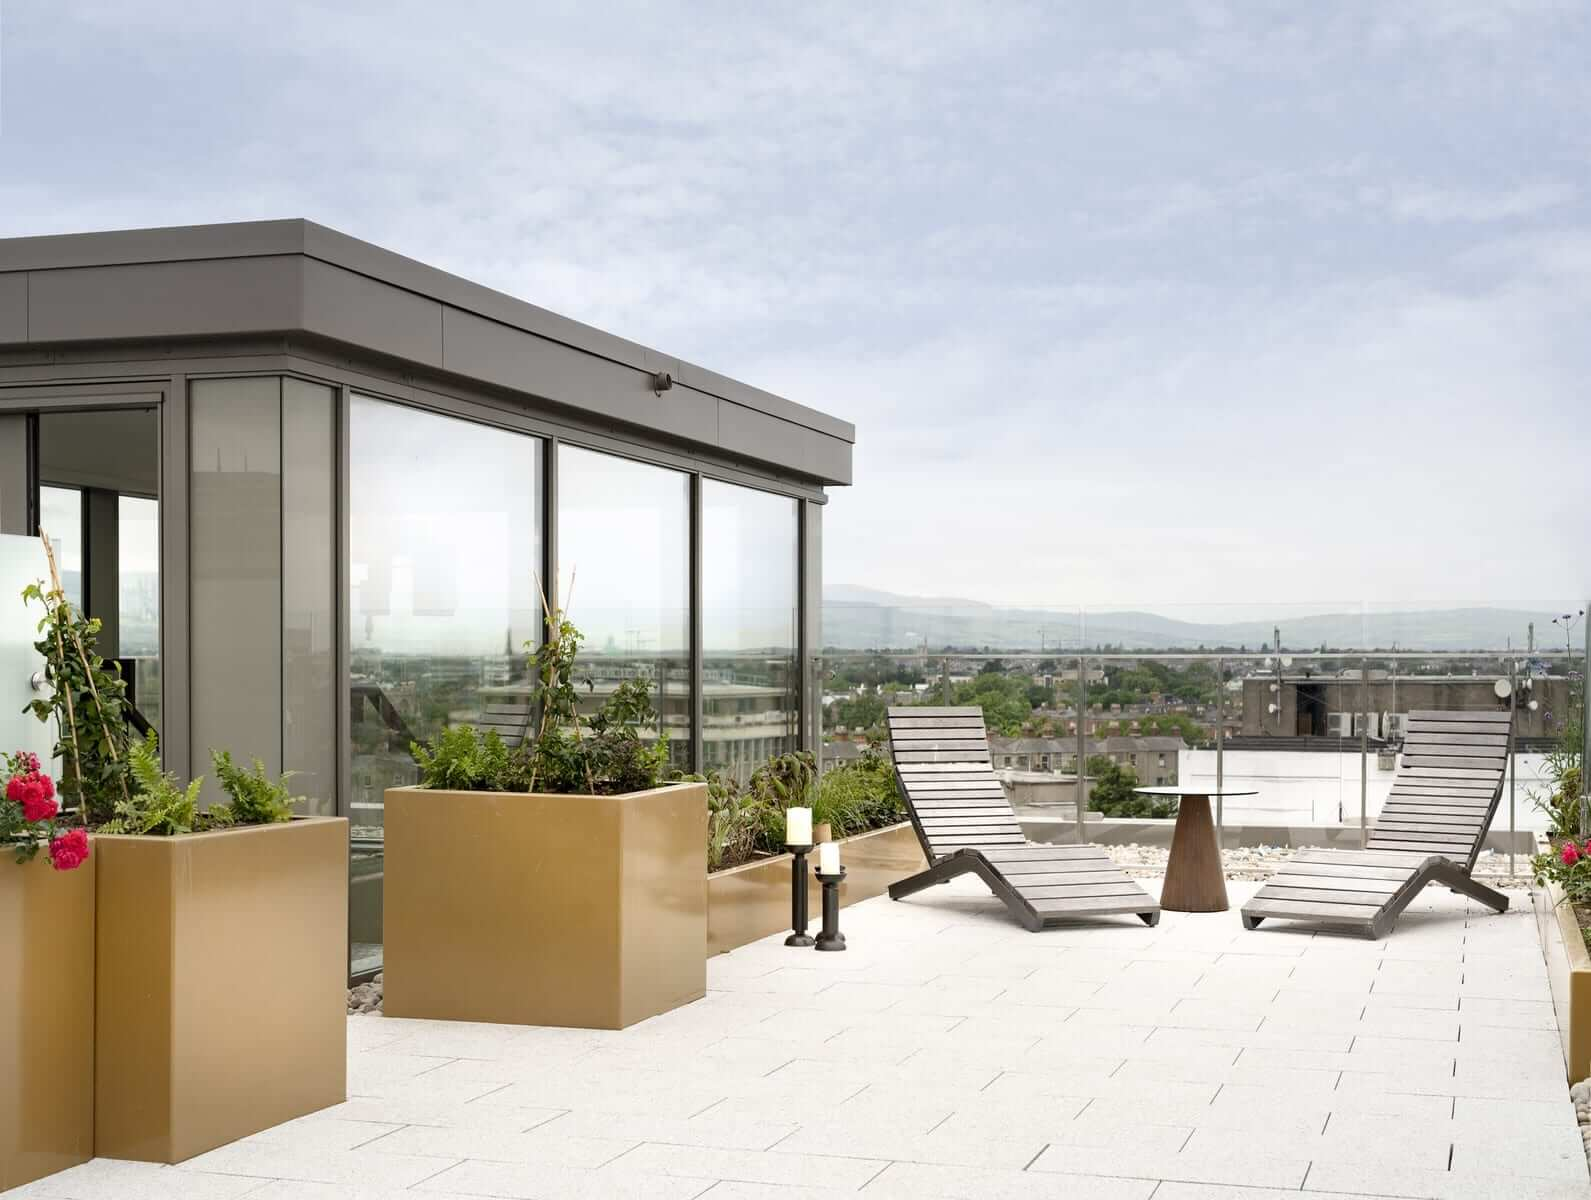 Lansdowne Place | Penthouse Roof Terrace, Second Image